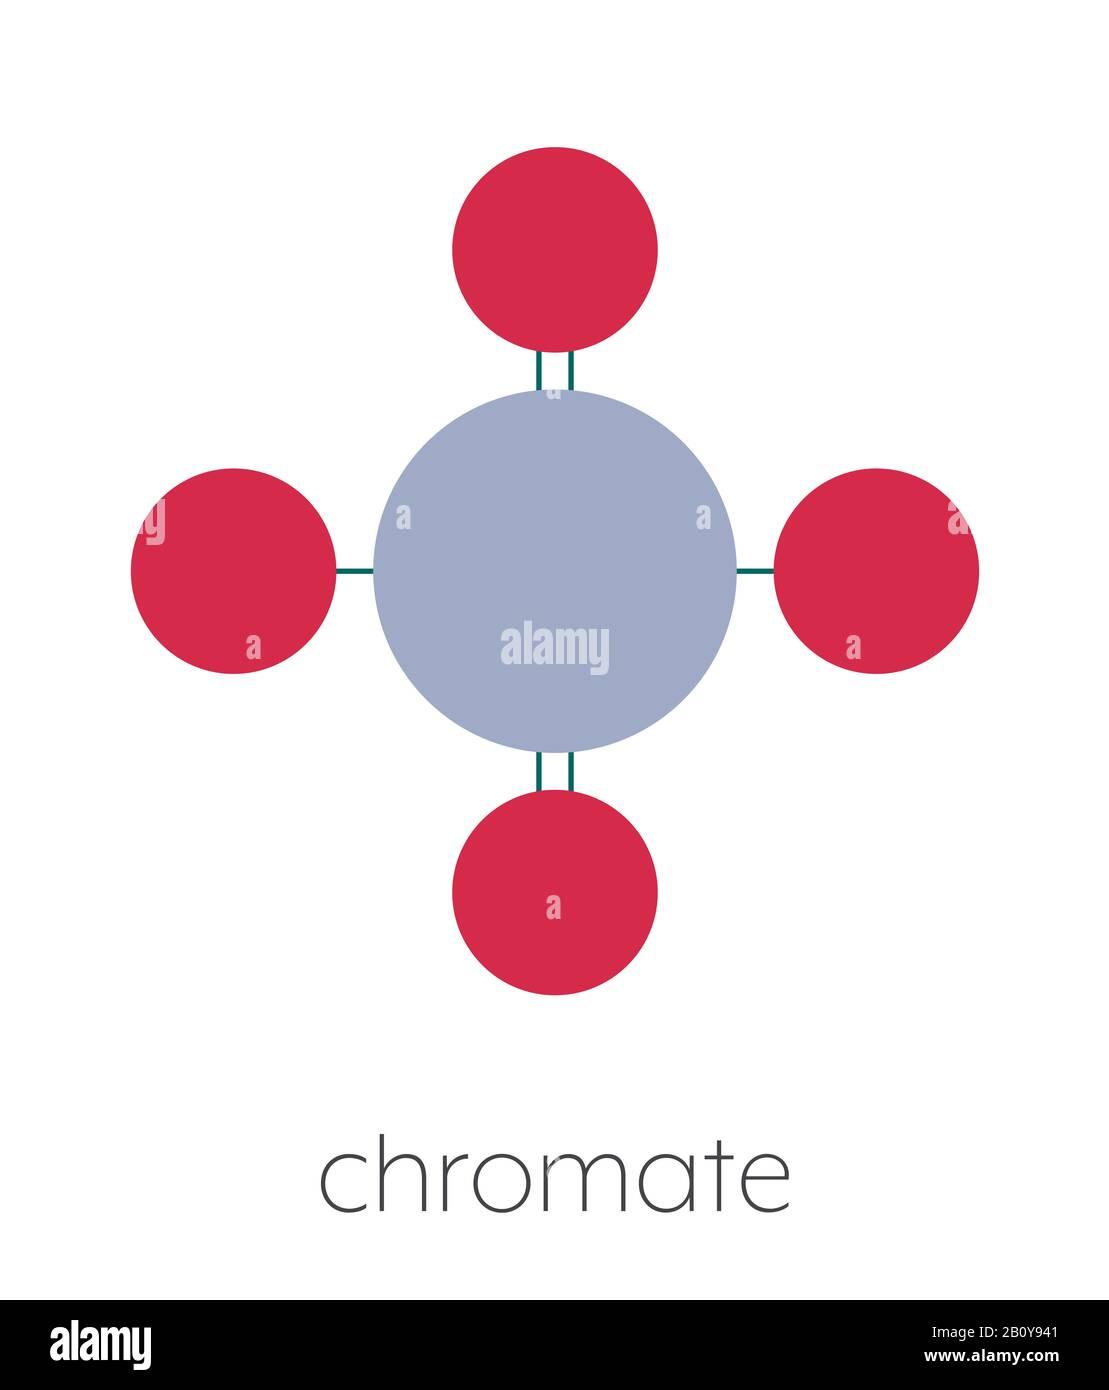 Chromate Anion Chemical Formula : chromate, anion, chemical, formula, Chromate, Molecular, Resolution, Stock, Photography, Images, Alamy